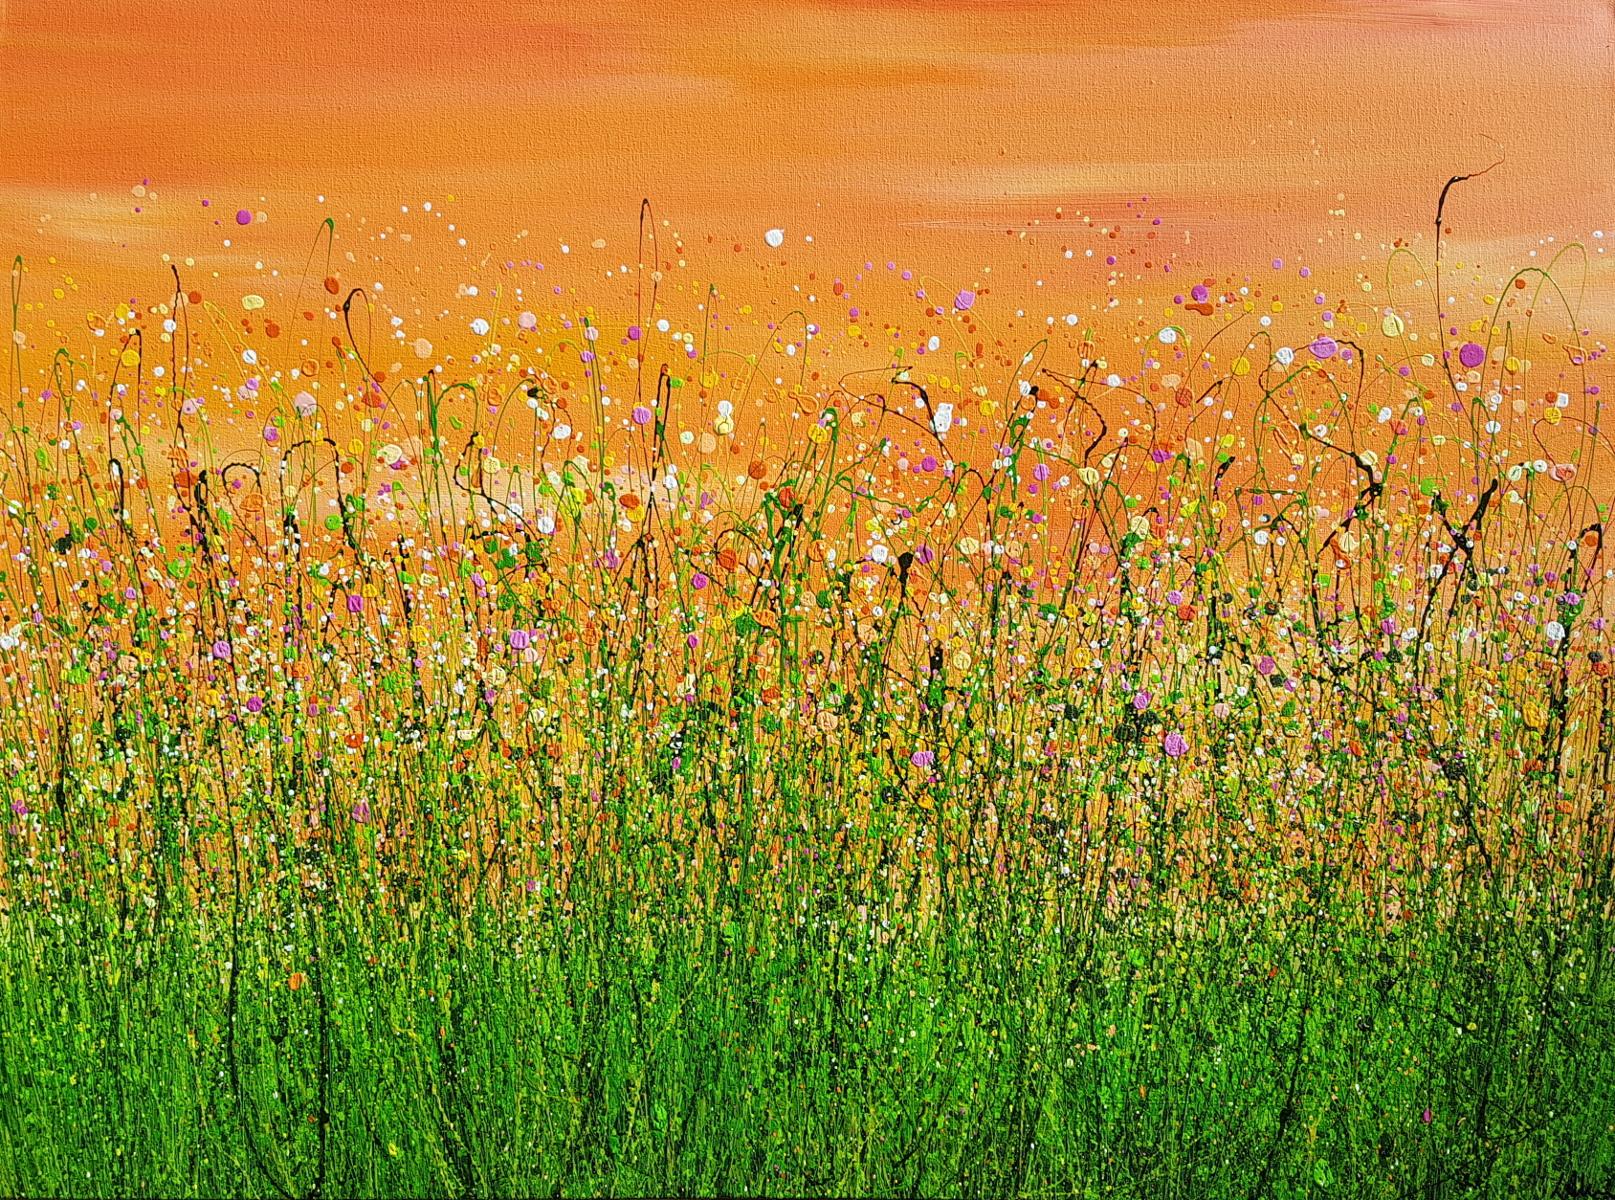 Tangerine Dream #4